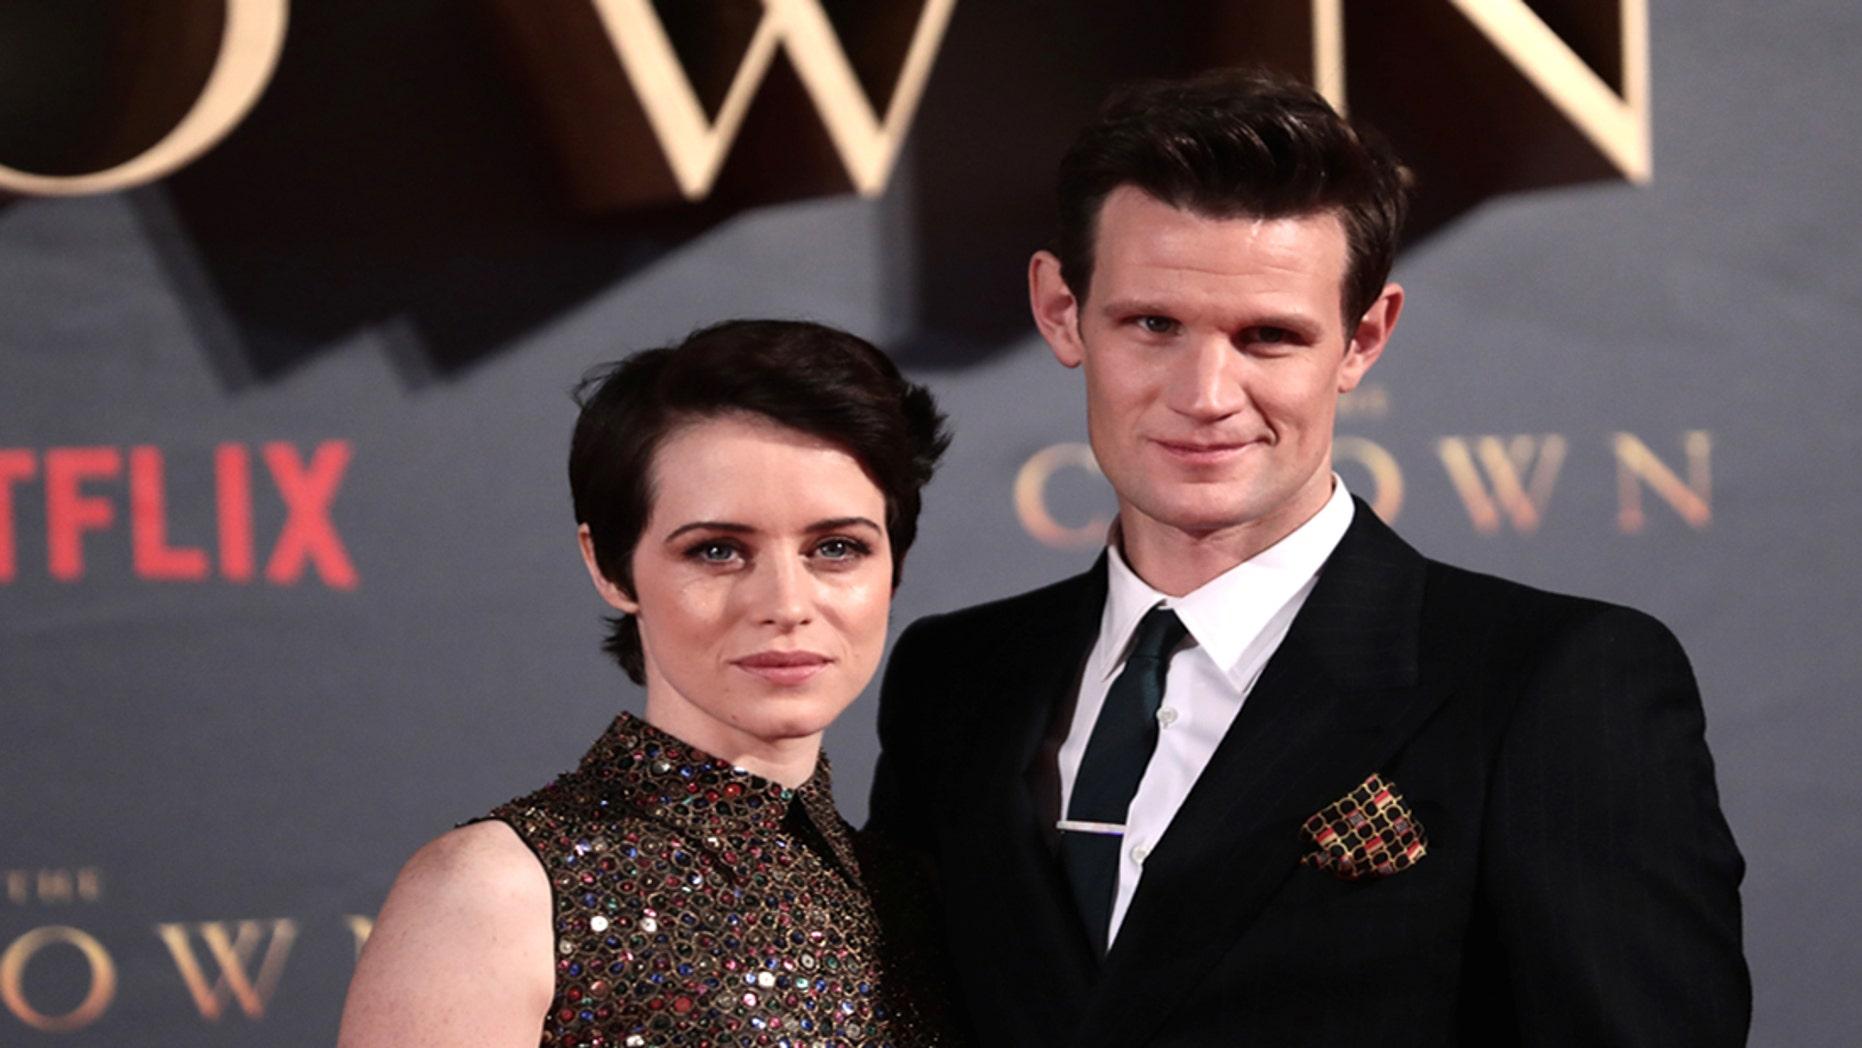 "Actors Claire Foy, who plays Queen Elizabeth II, and Matt Smith who plays Philip Duke of Edinburgh, attend the premiere of ""The Crown"" Season 2 in London, Britain, November 21, 2017. REUTERS/Simon Dawson - RC111B38EA60"